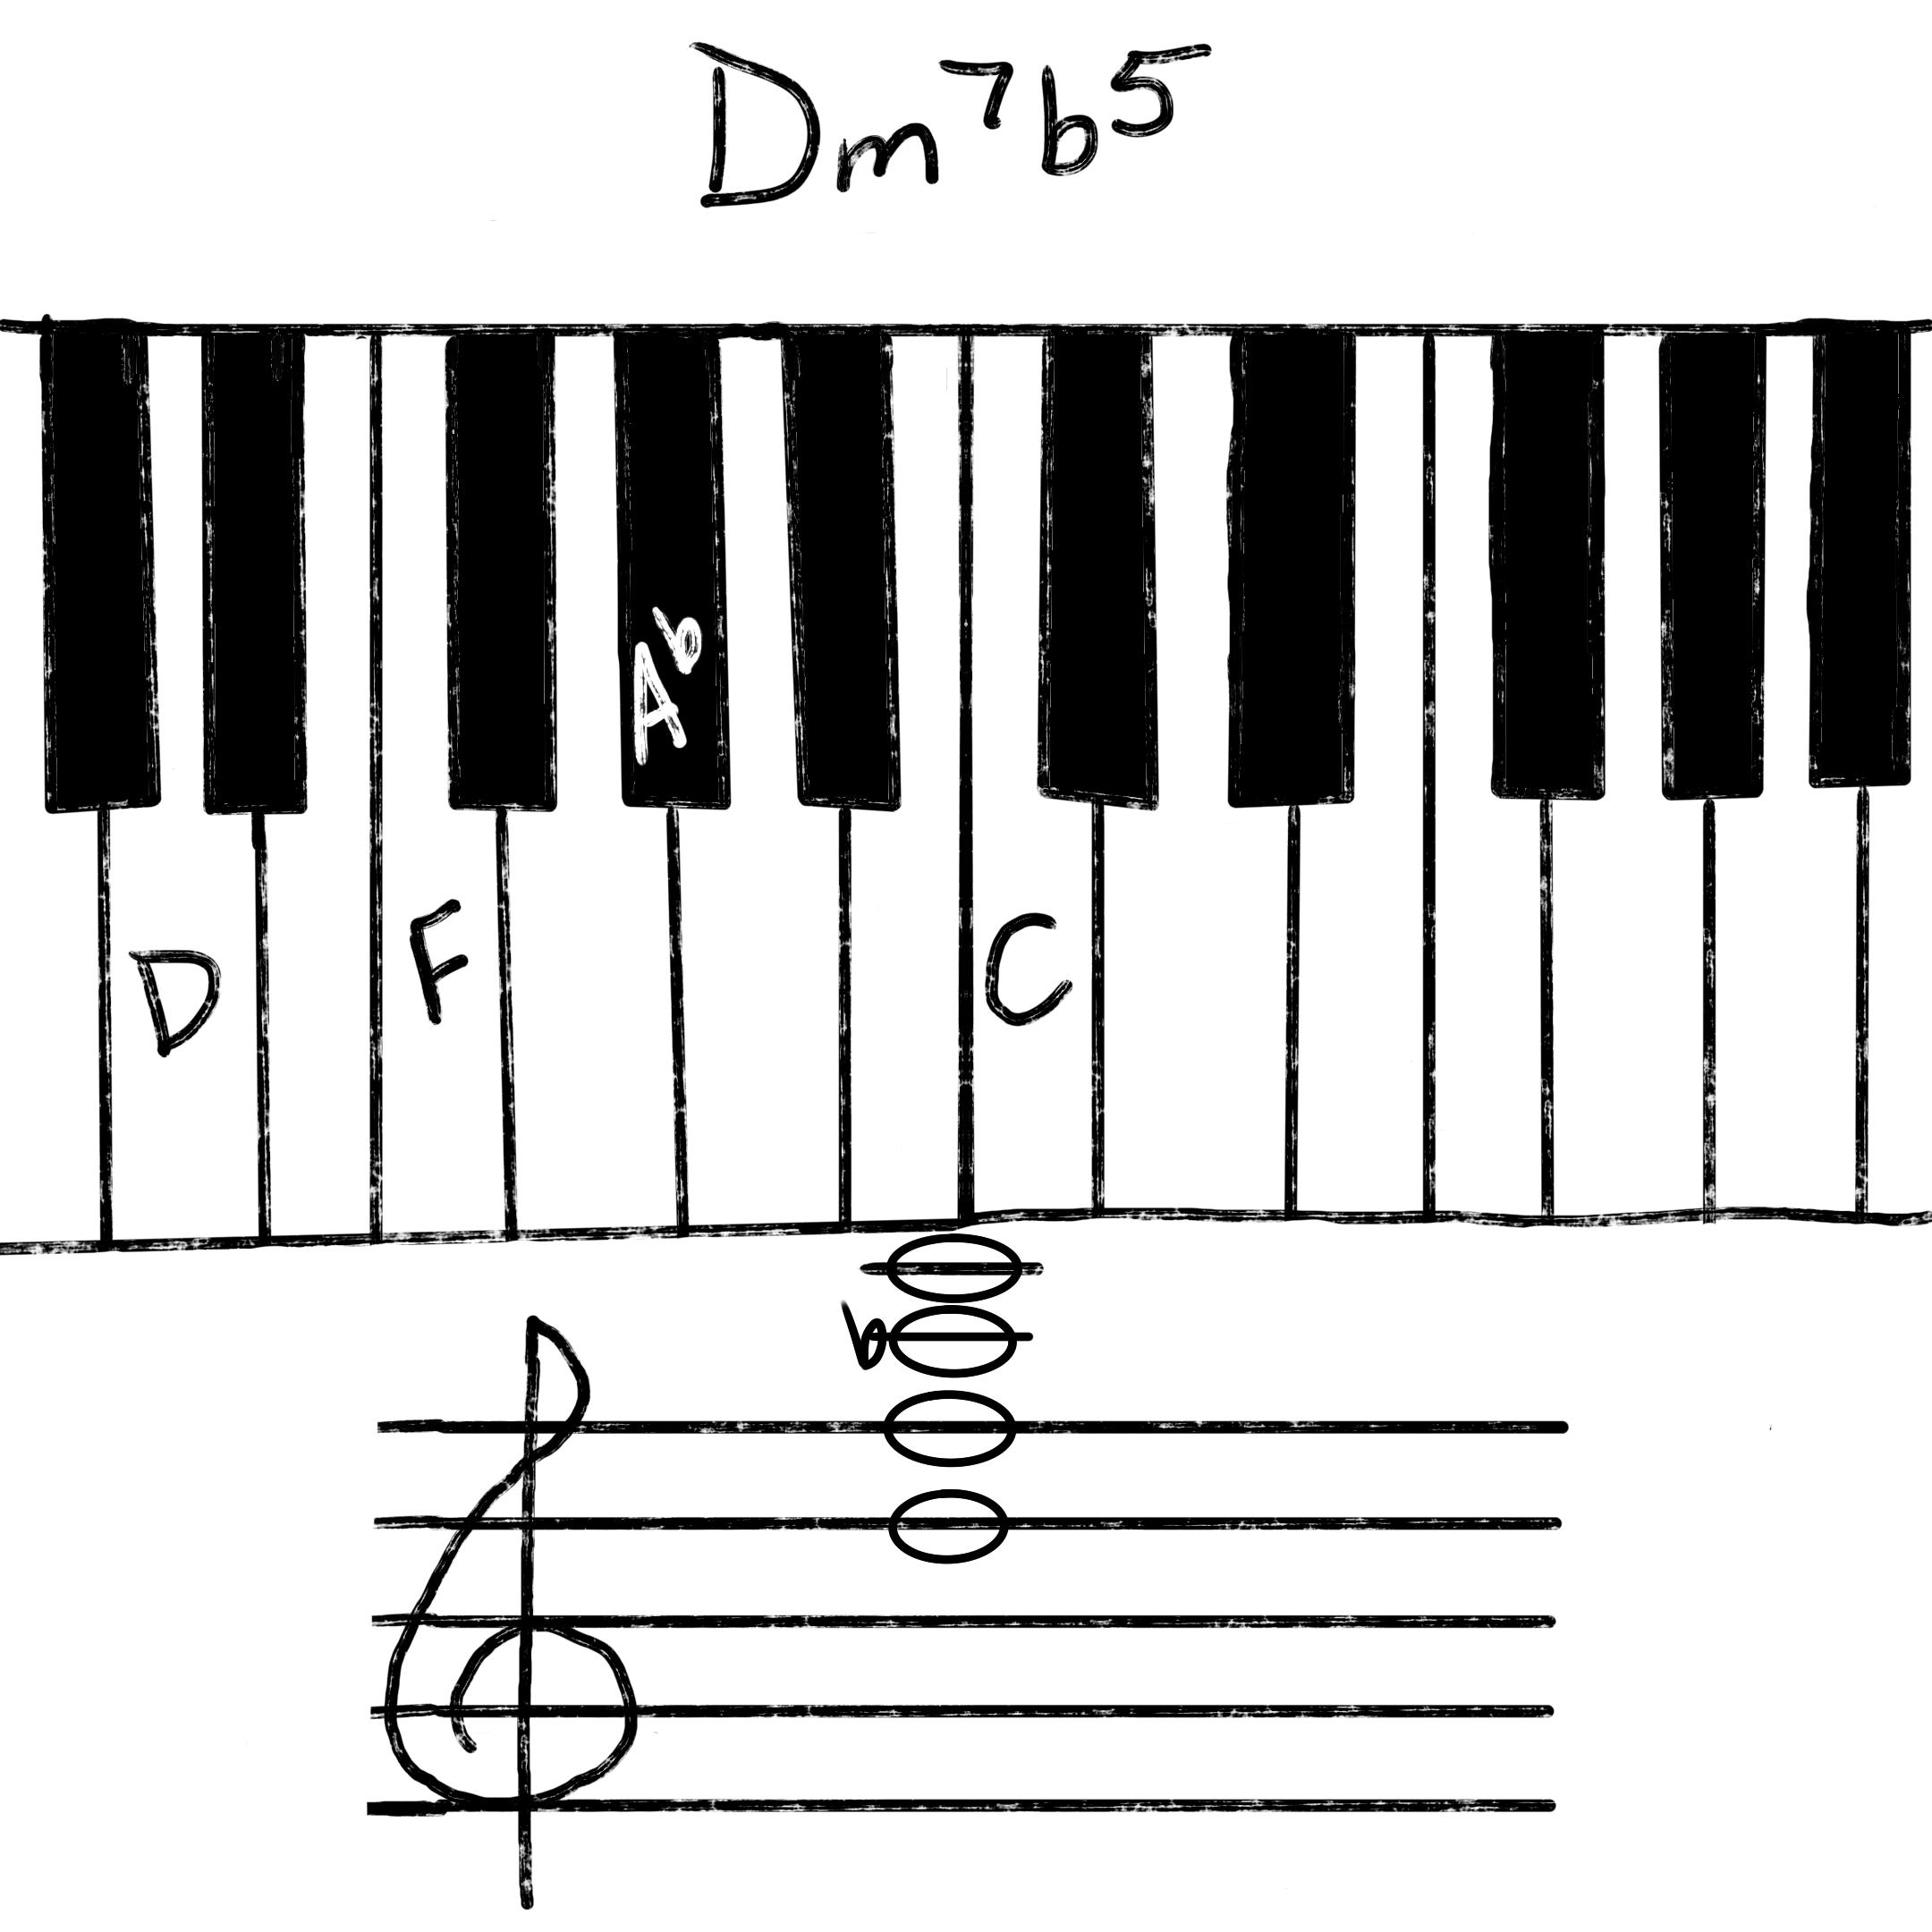 Dm7b5